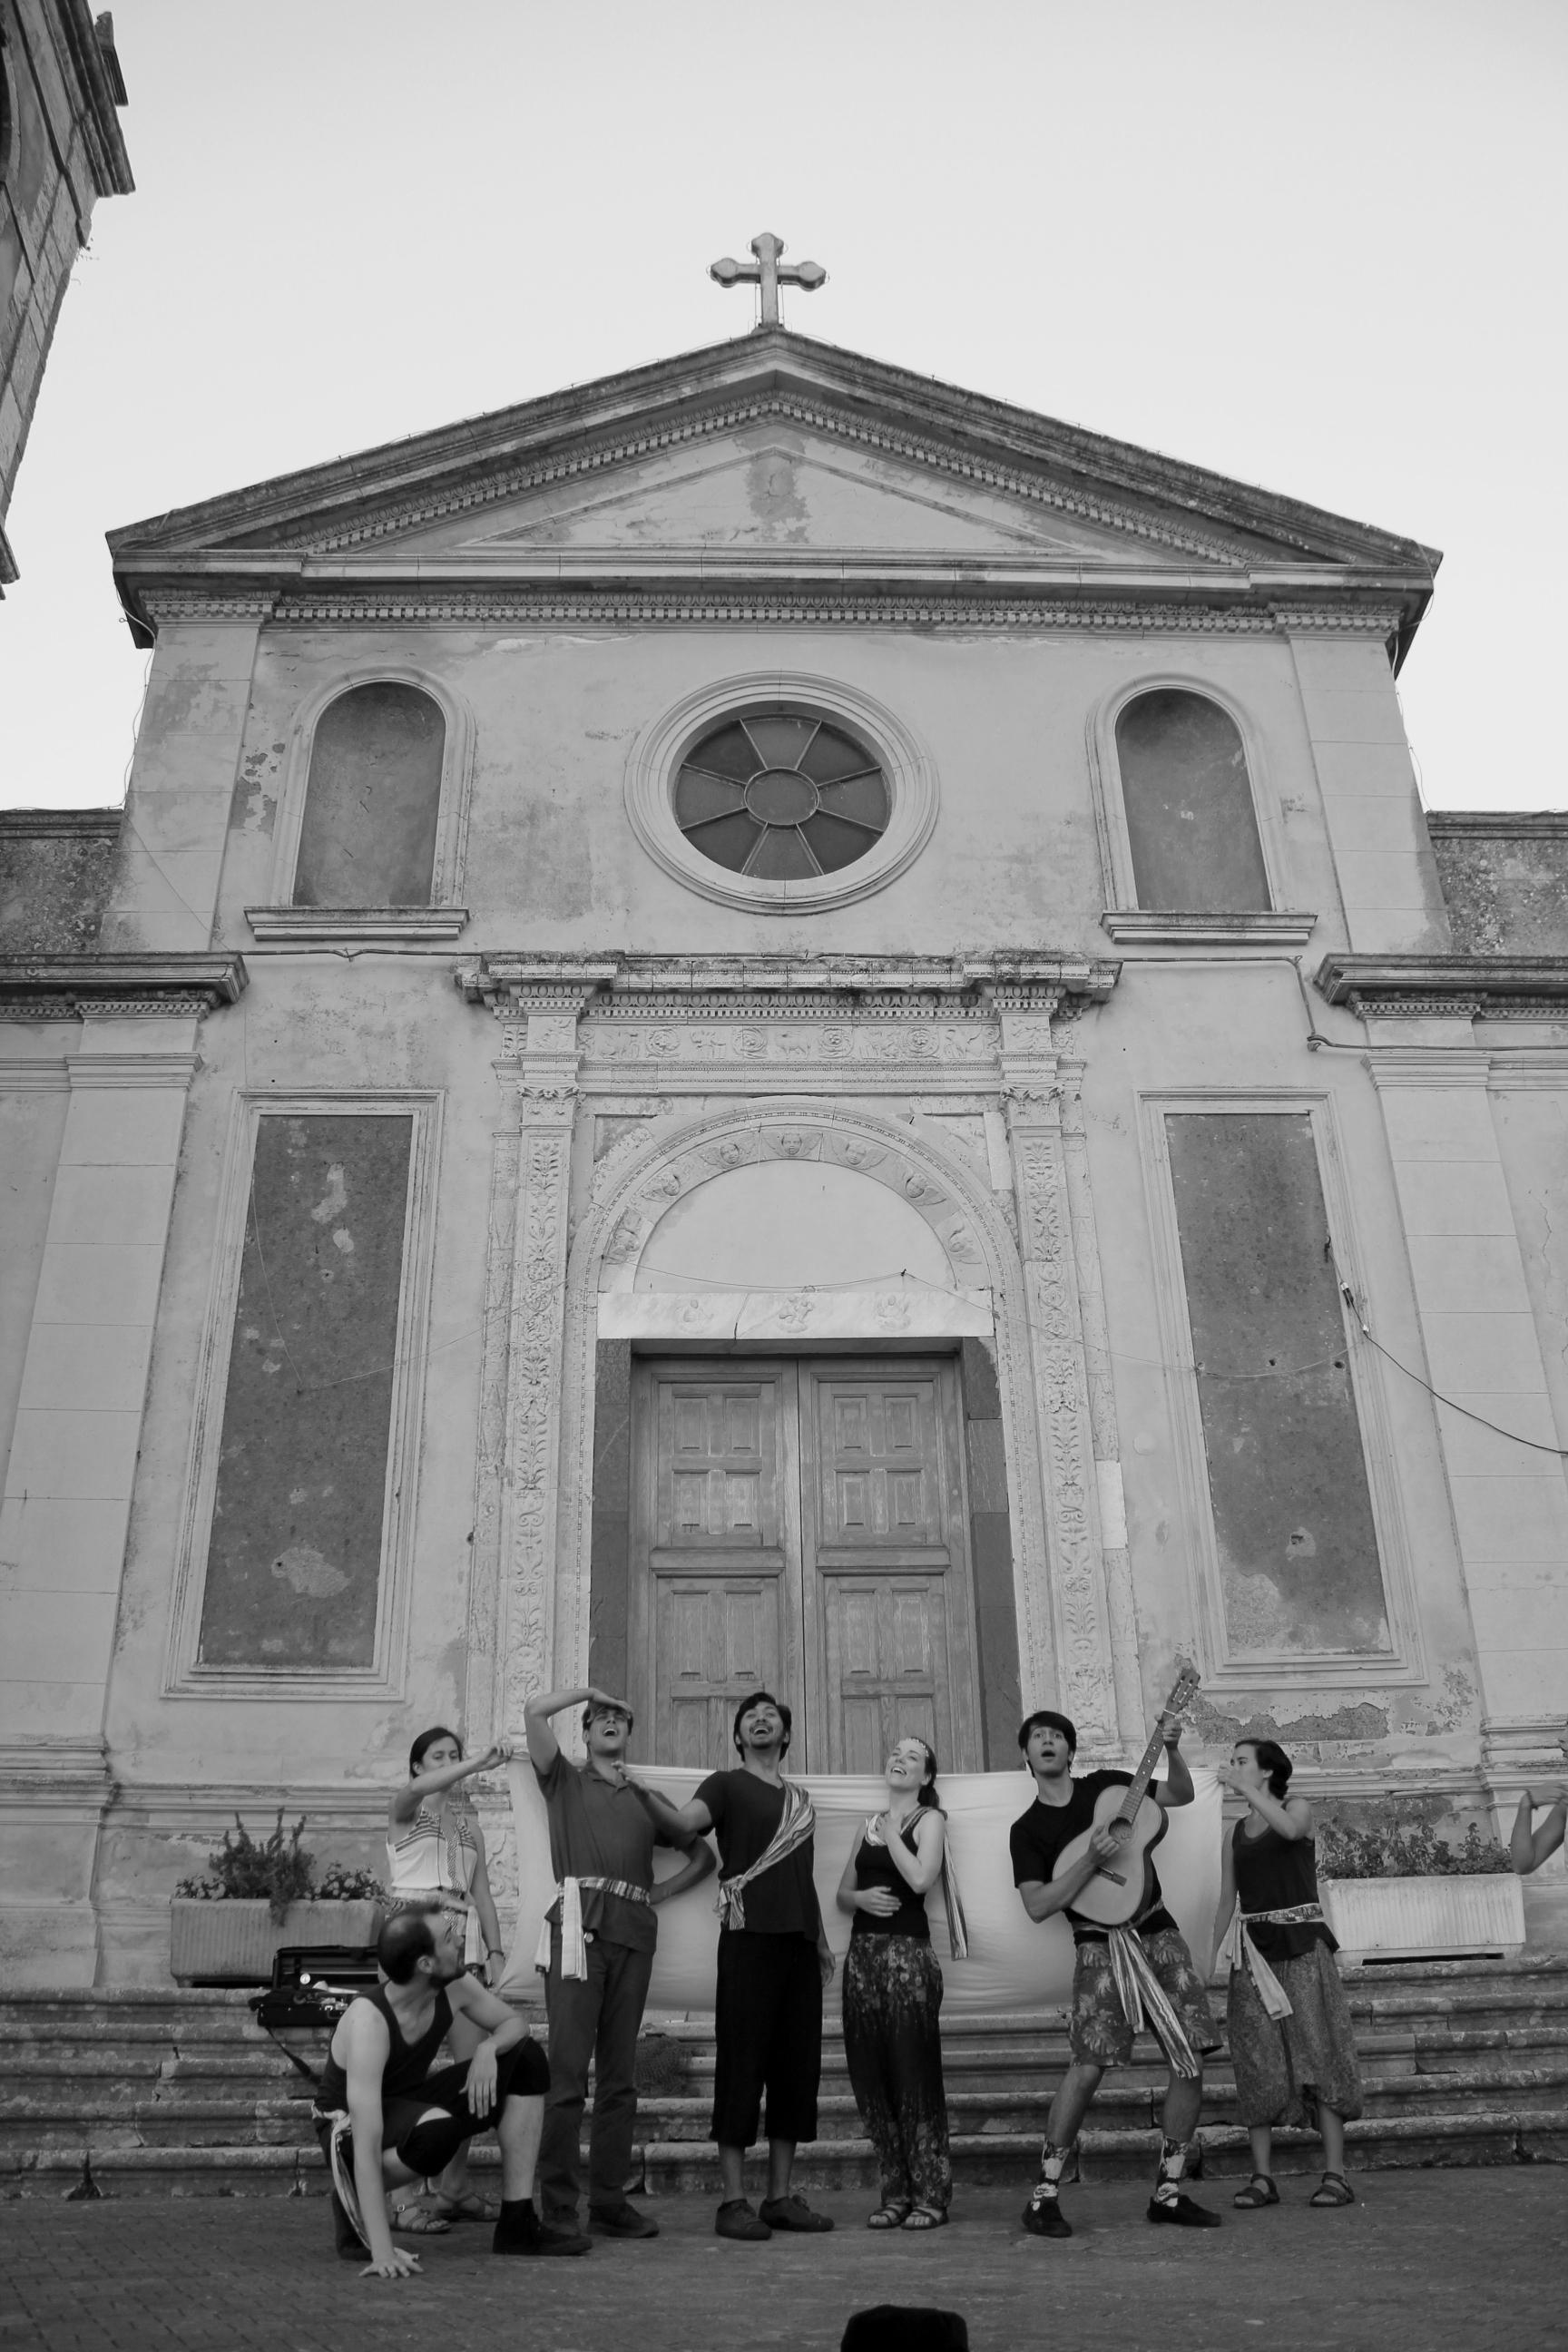 Copy of Preparing for opening night at the Piazza San Nicolò di Bari in Pezzolo